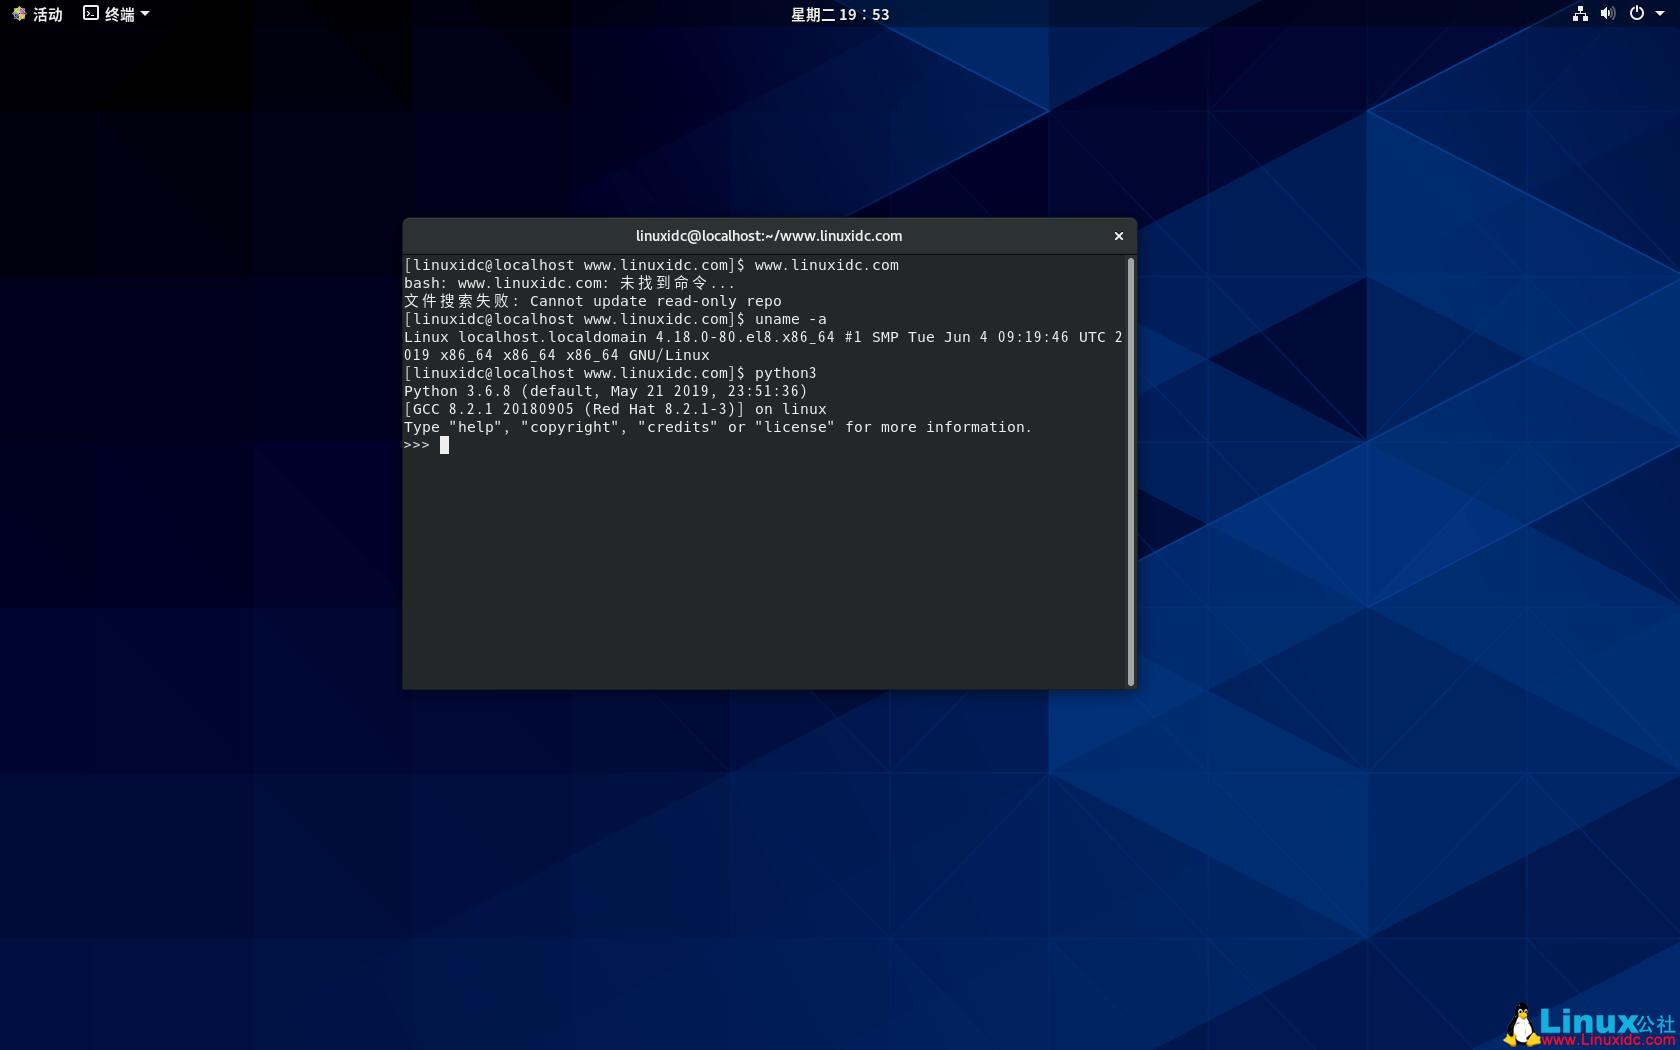 VMware虚拟机安装 CentOS 8.0-1905 系统